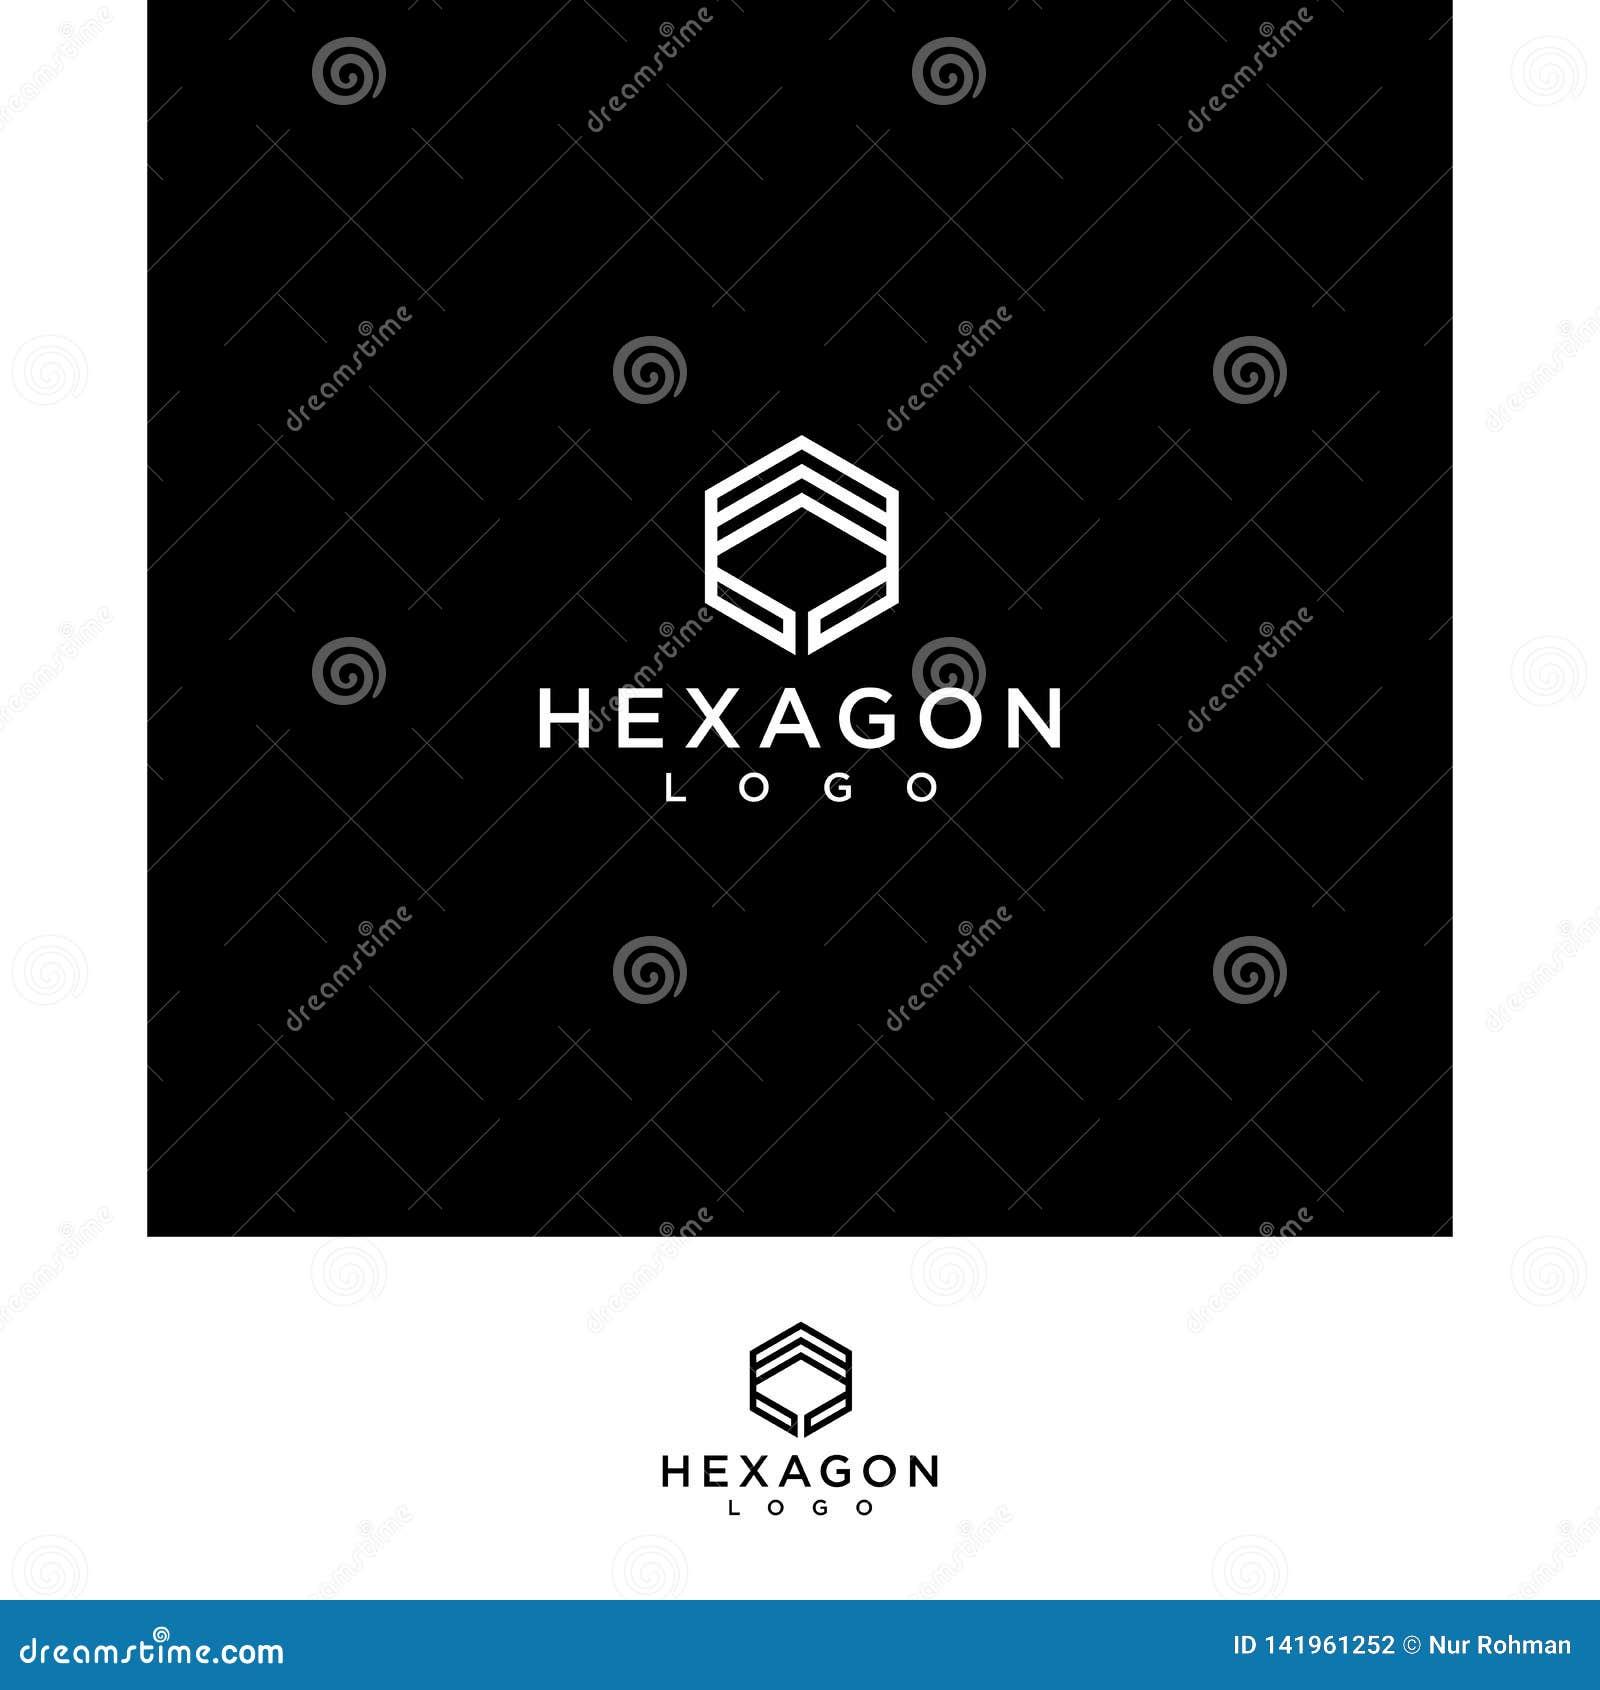 Creative and professional logo black hexagon line